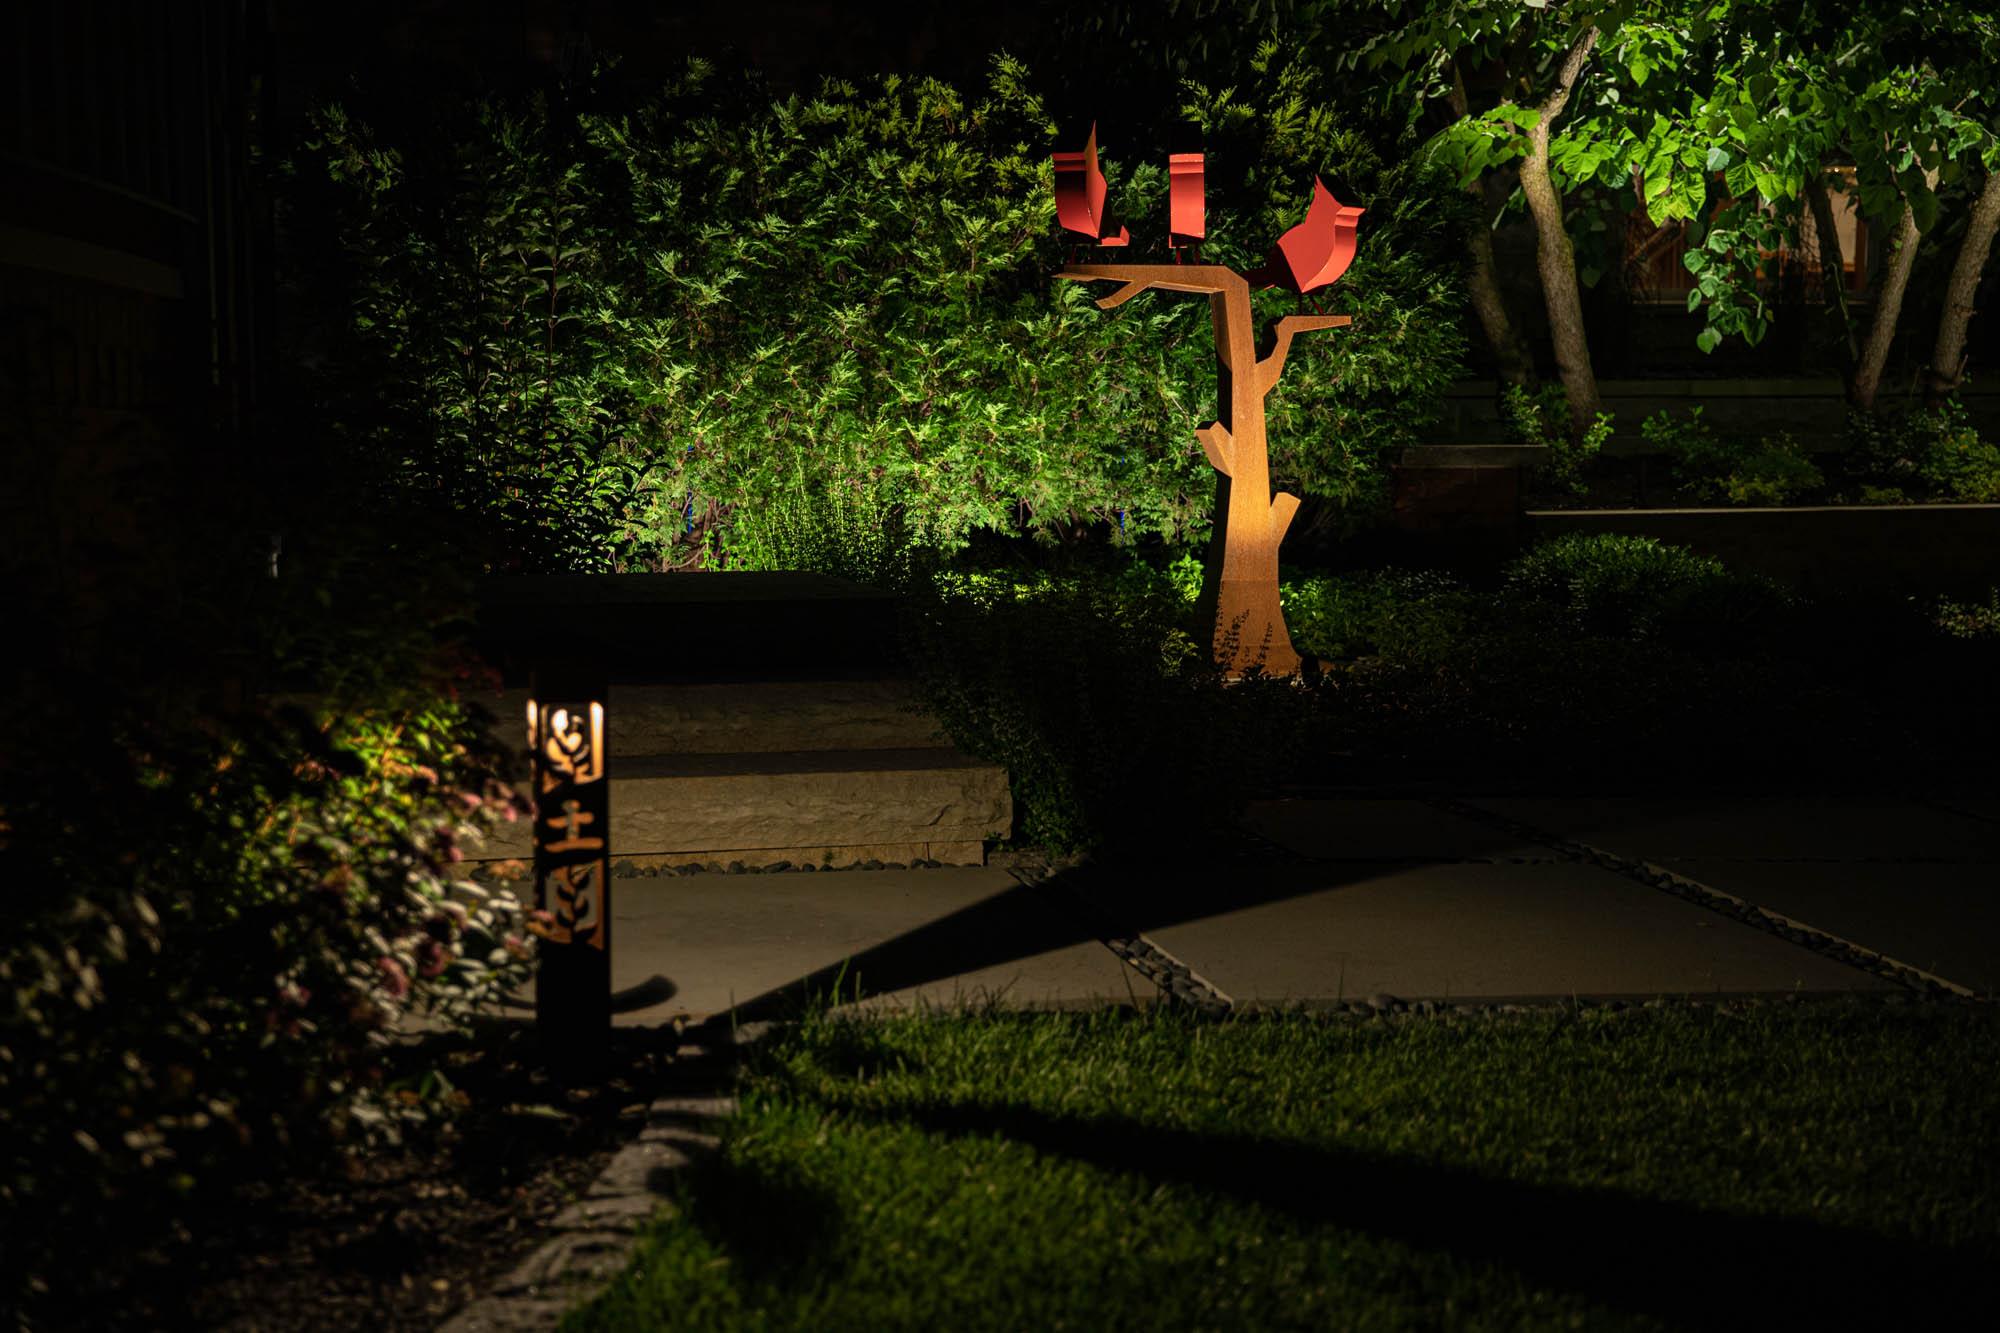 brookfield landscape lighting night owl outdoor decorative art corten steel statuary